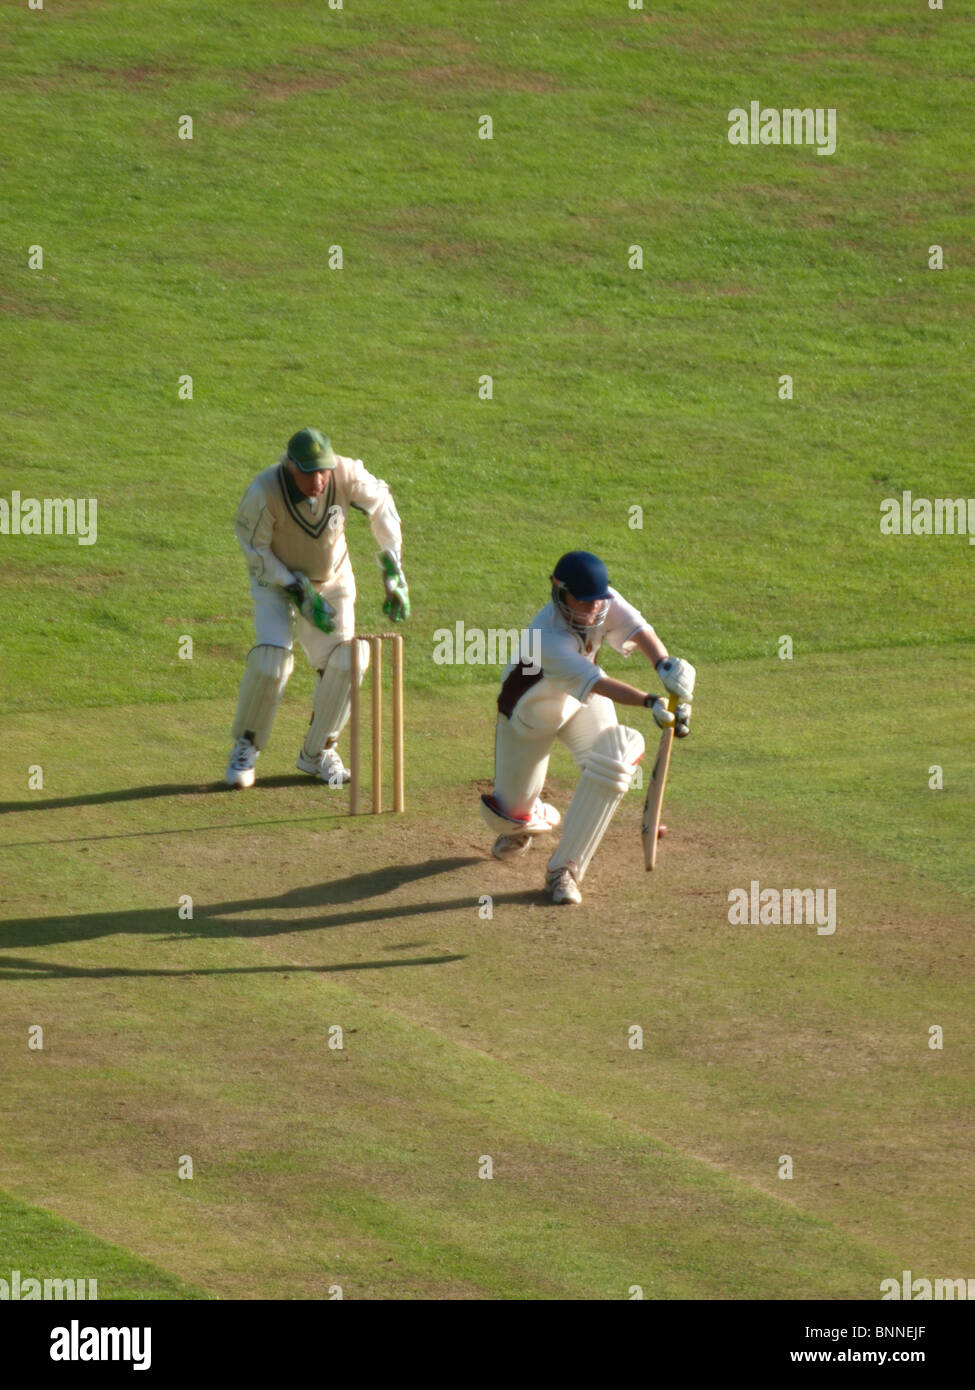 Batsman playing a shot during cricket match, Bude, Cornwall, UK - Stock Image